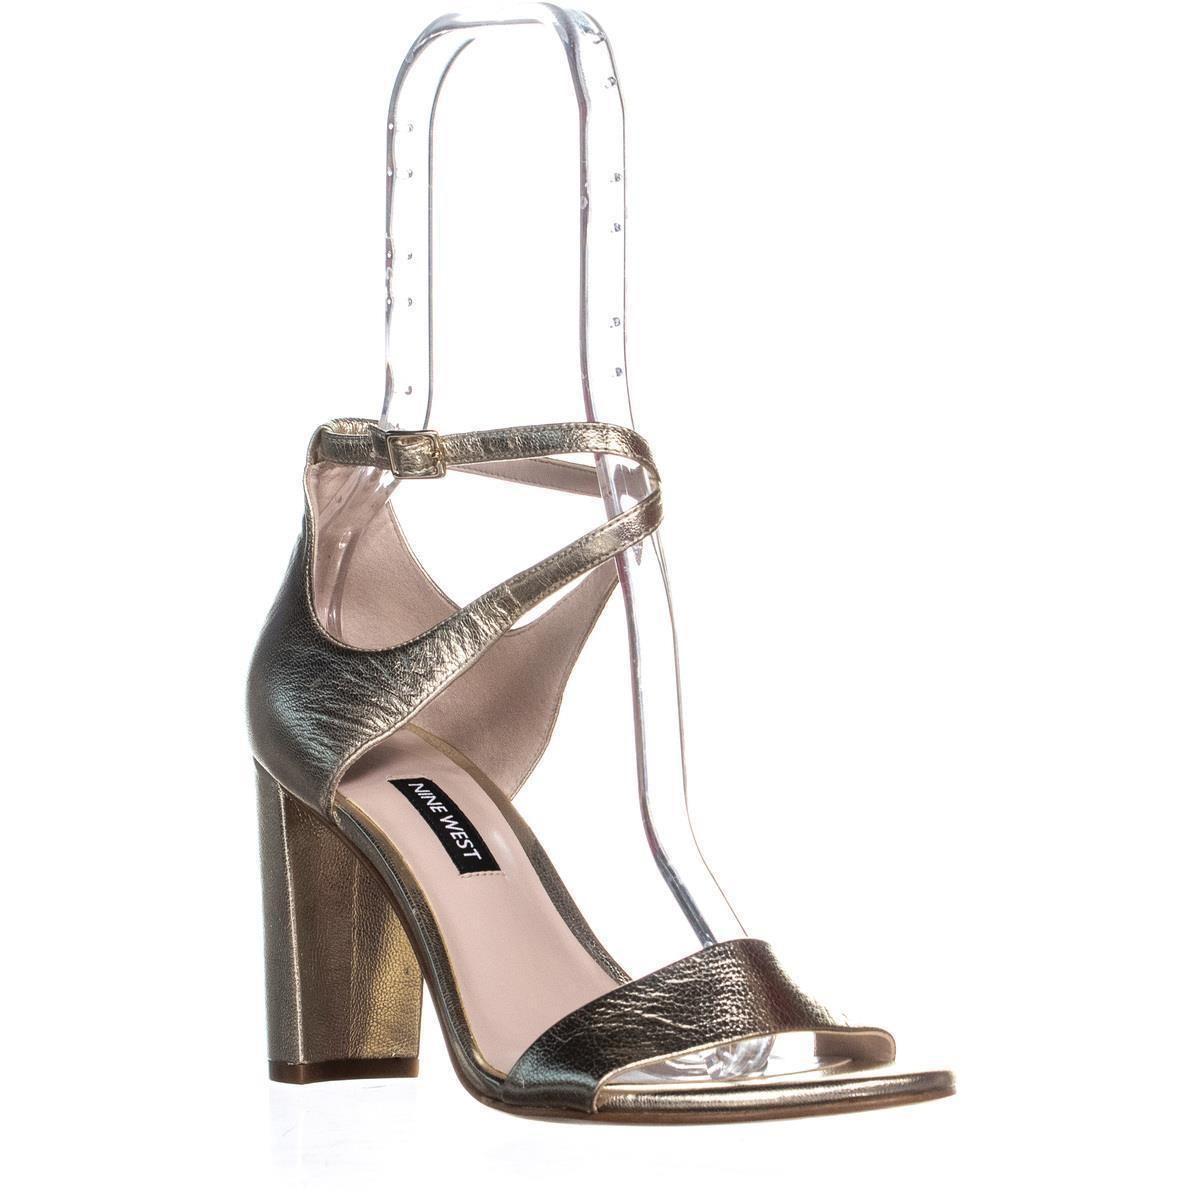 68bf7578b7c9 Nine West - Metallic Nunzaya Heeled Ankle Strap Sandals - Lyst. View  fullscreen